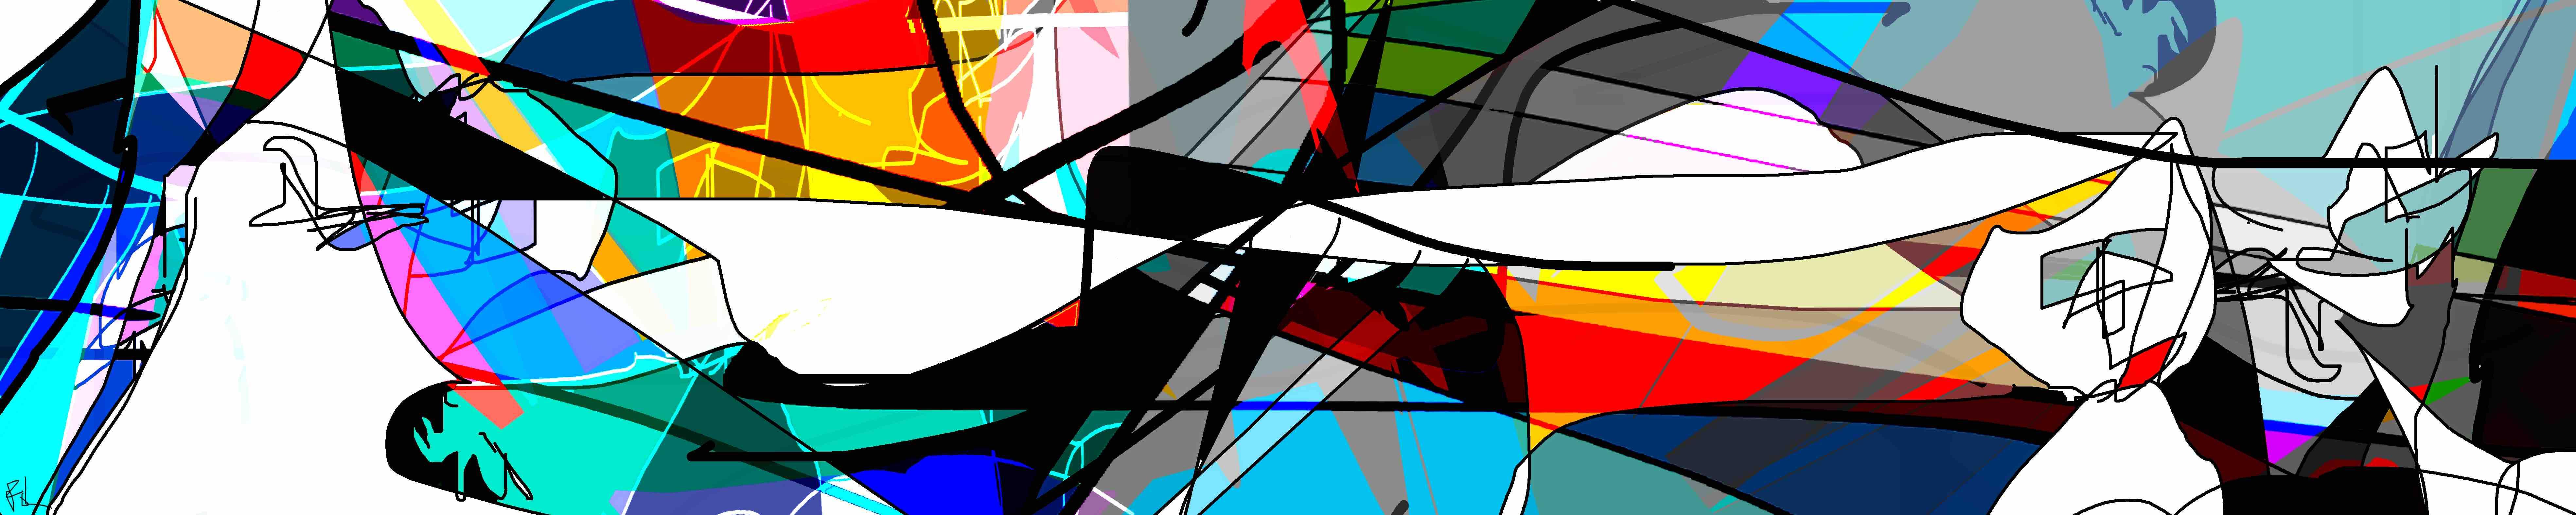 Eclaircie 200 x 40 ©FOL